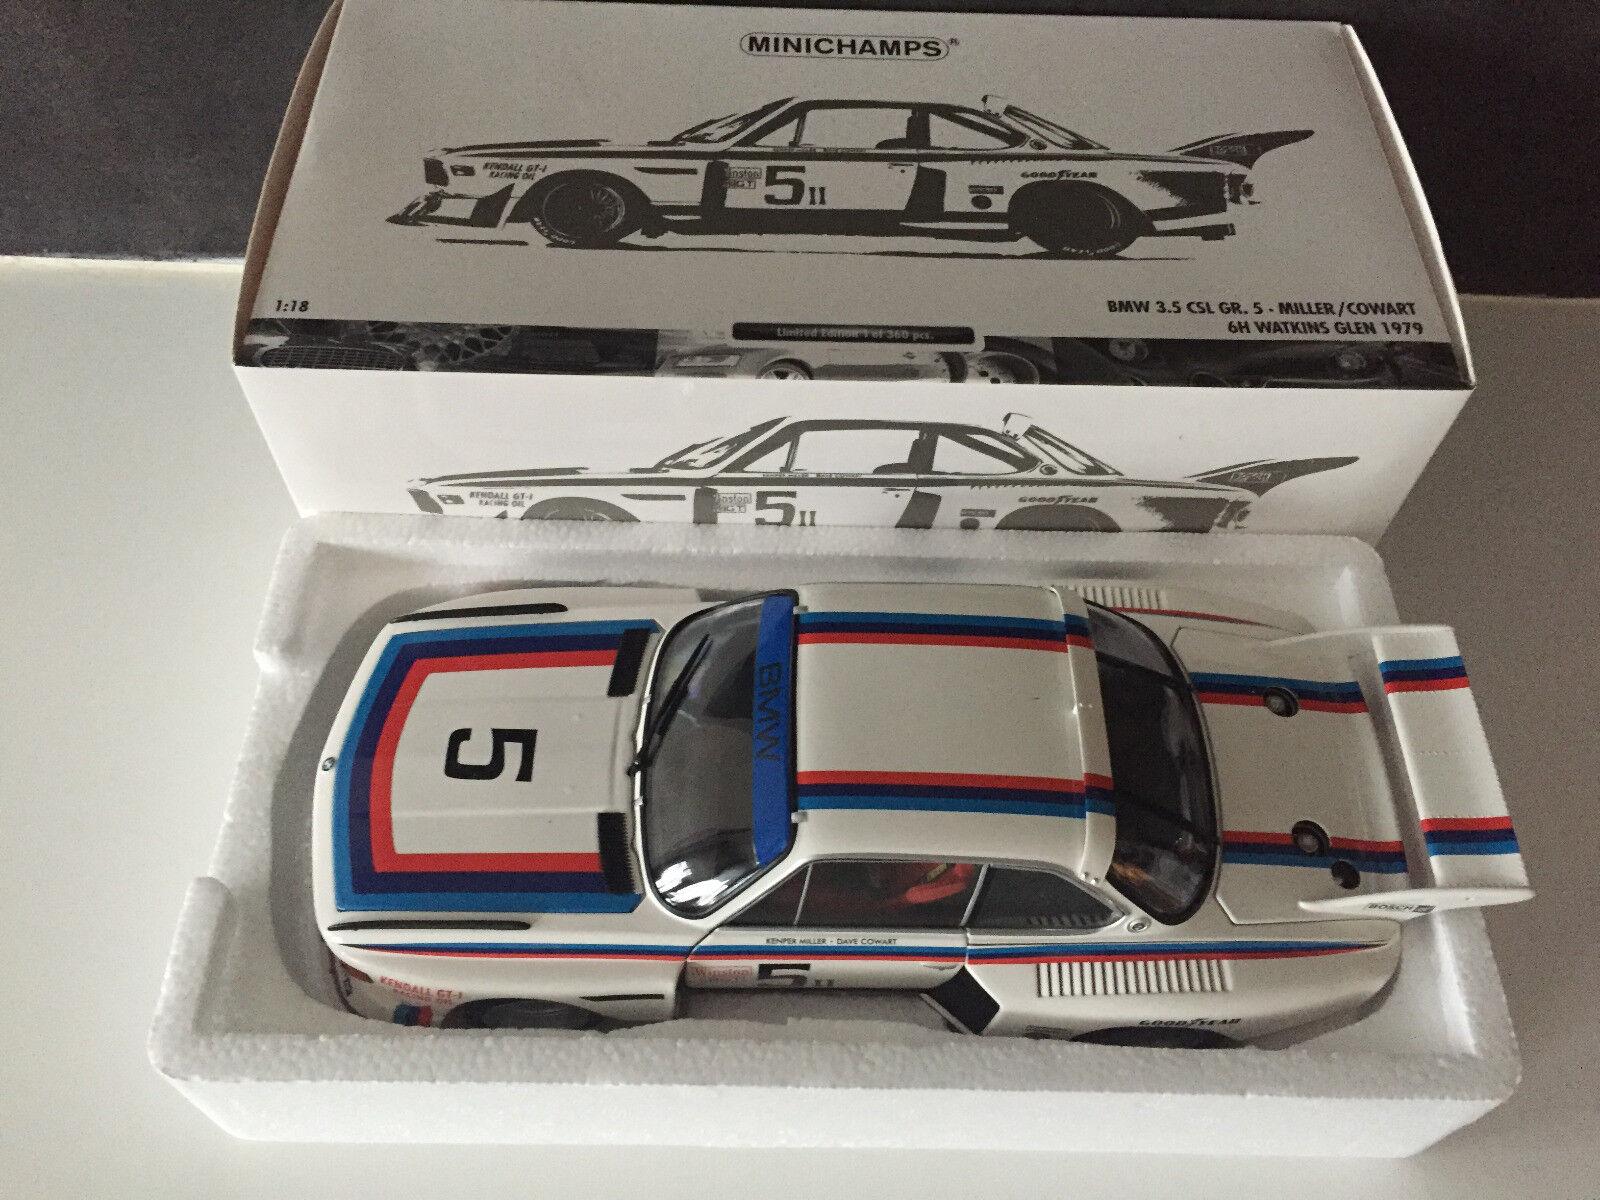 BMW 3.5 L CSL Groupe 5 Watkins Glen 1979 Minichamps 1 18